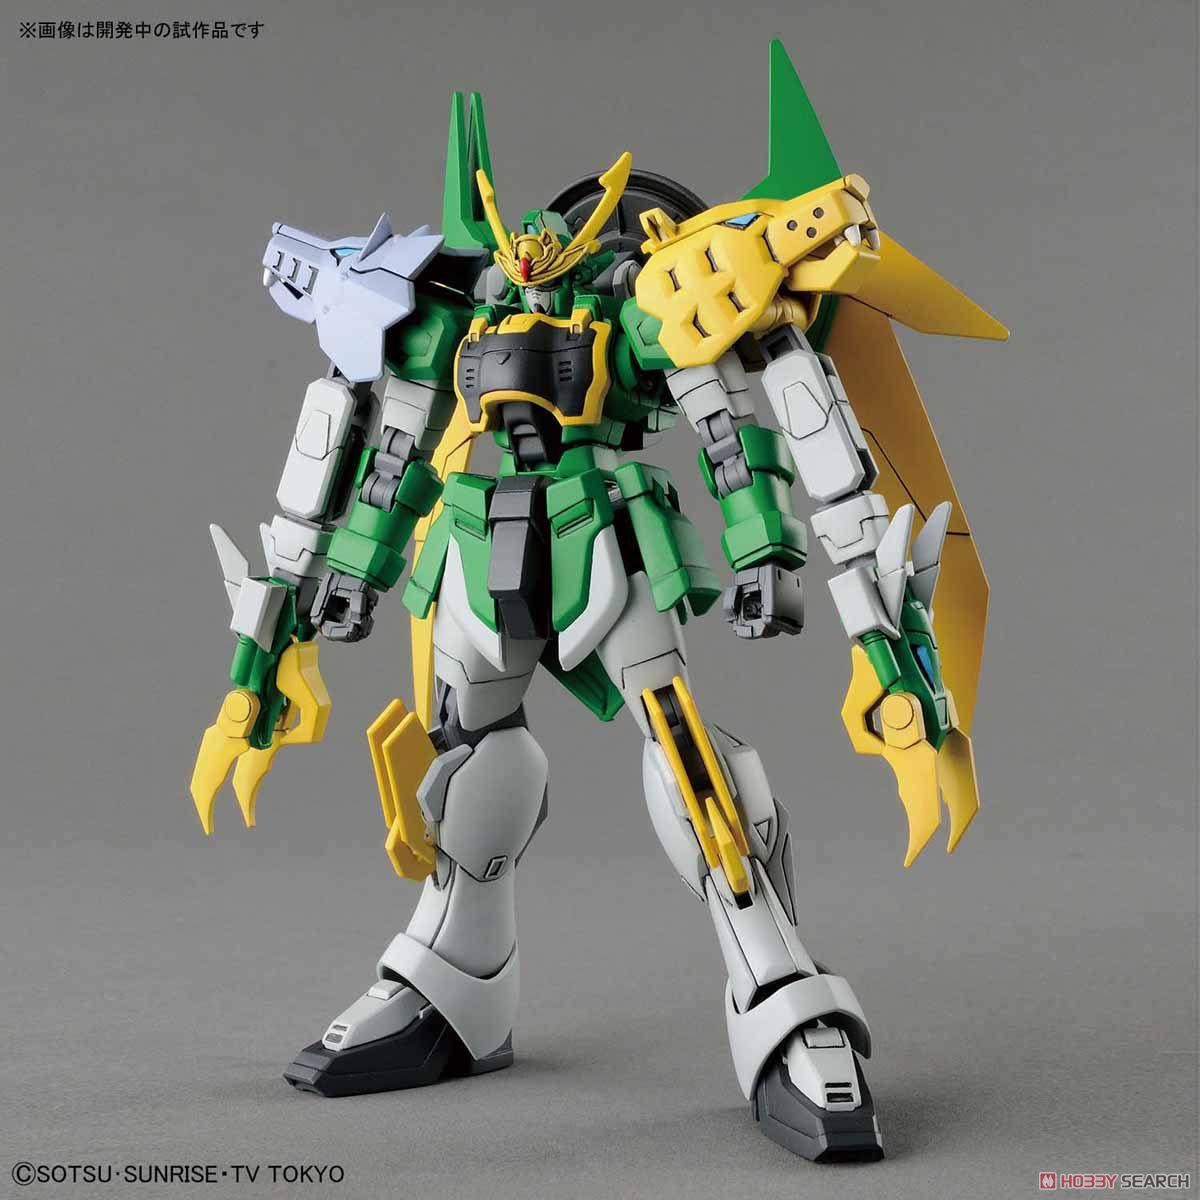 HG HGBD 011 1/144 Wolf Tiger, Double-headed Dragon, Gundam, Creater, Assembled Model